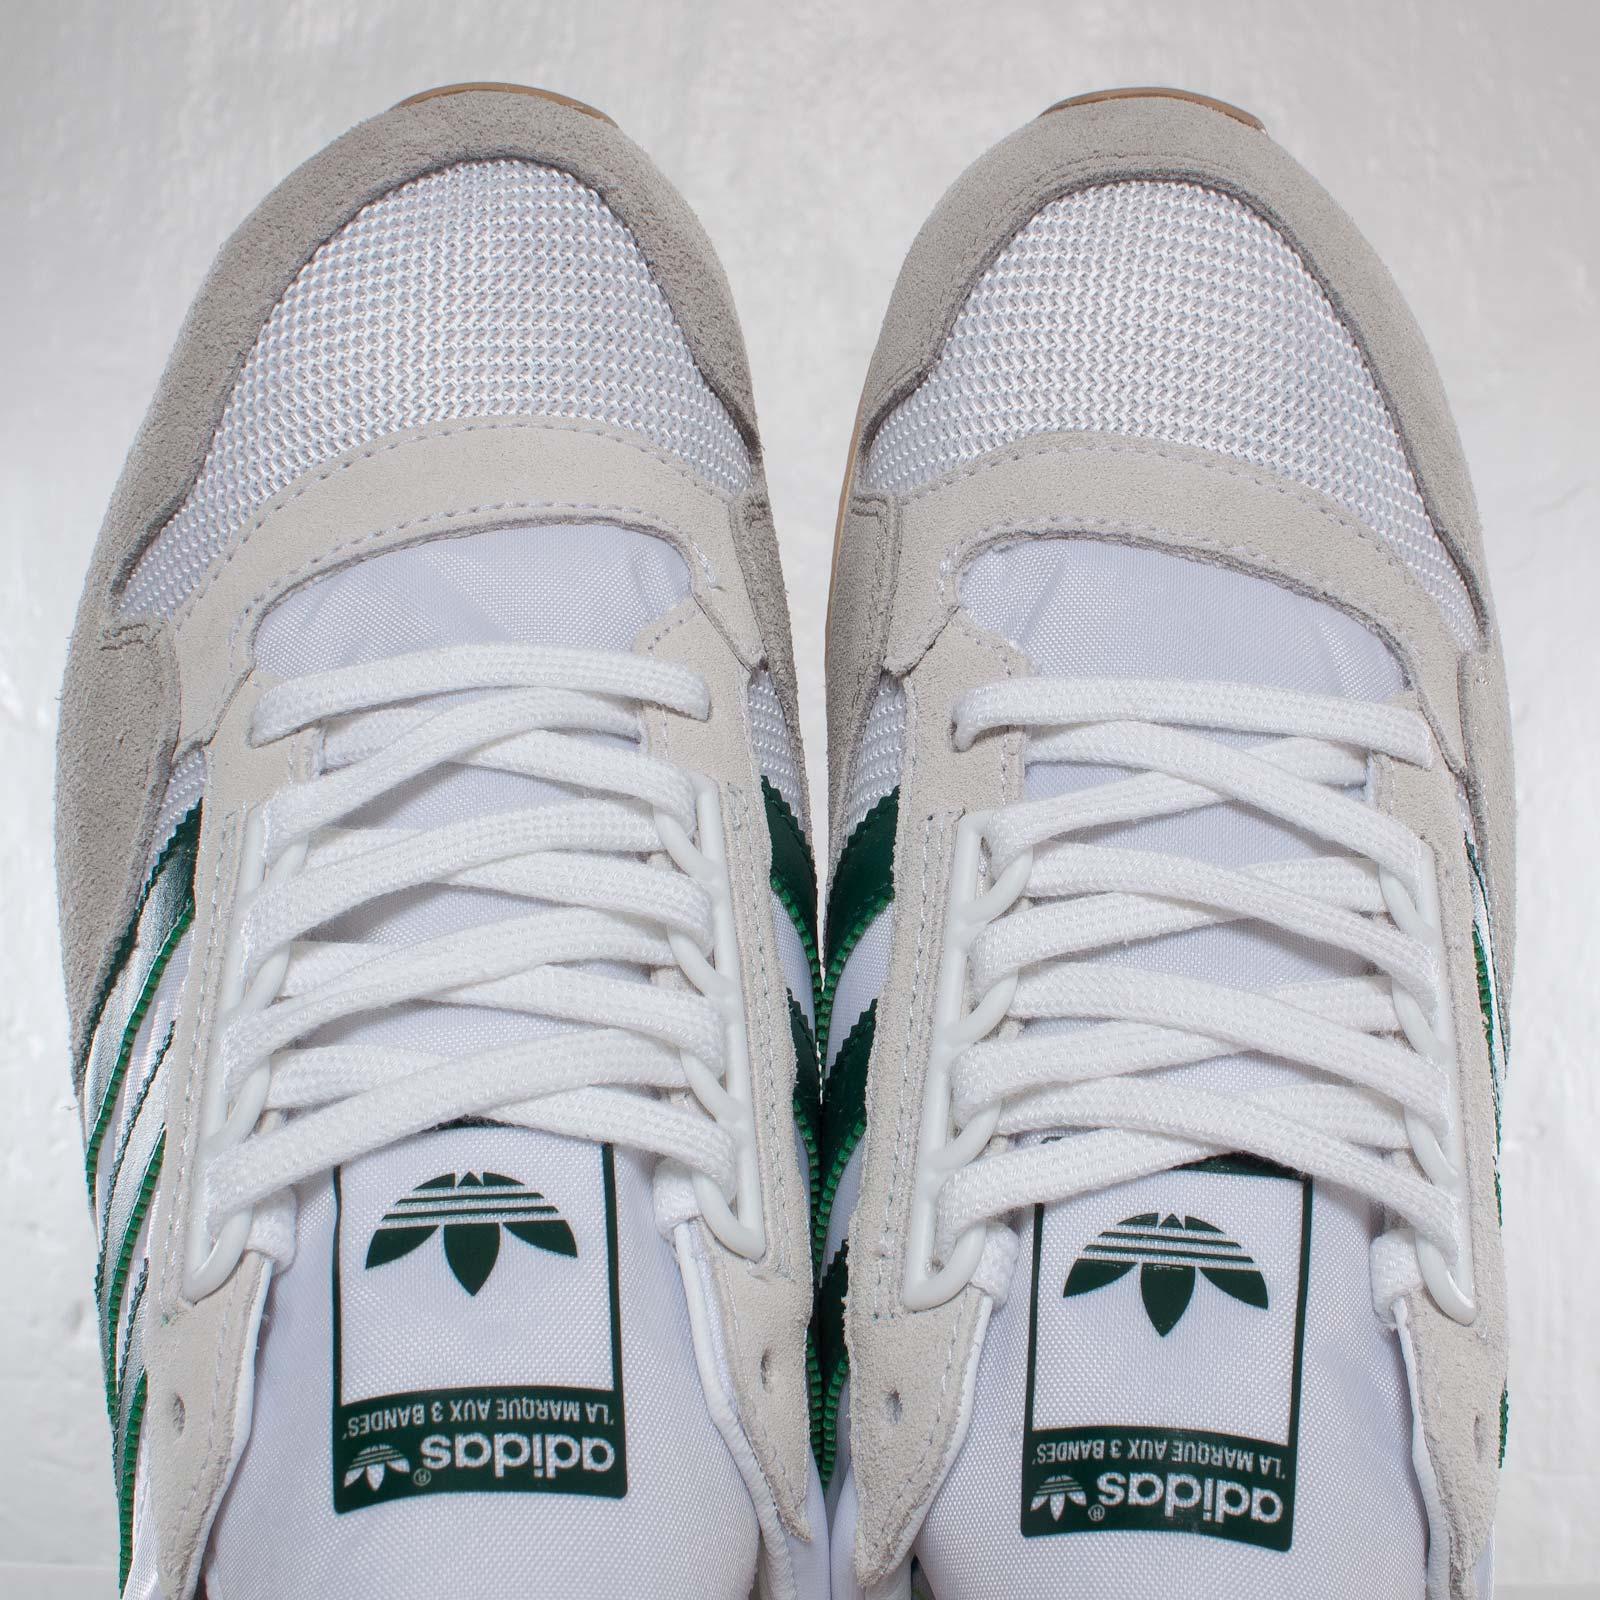 adidas ZX 500 OG UA - Q33994 - Sneakersnstuff  5978bbda5